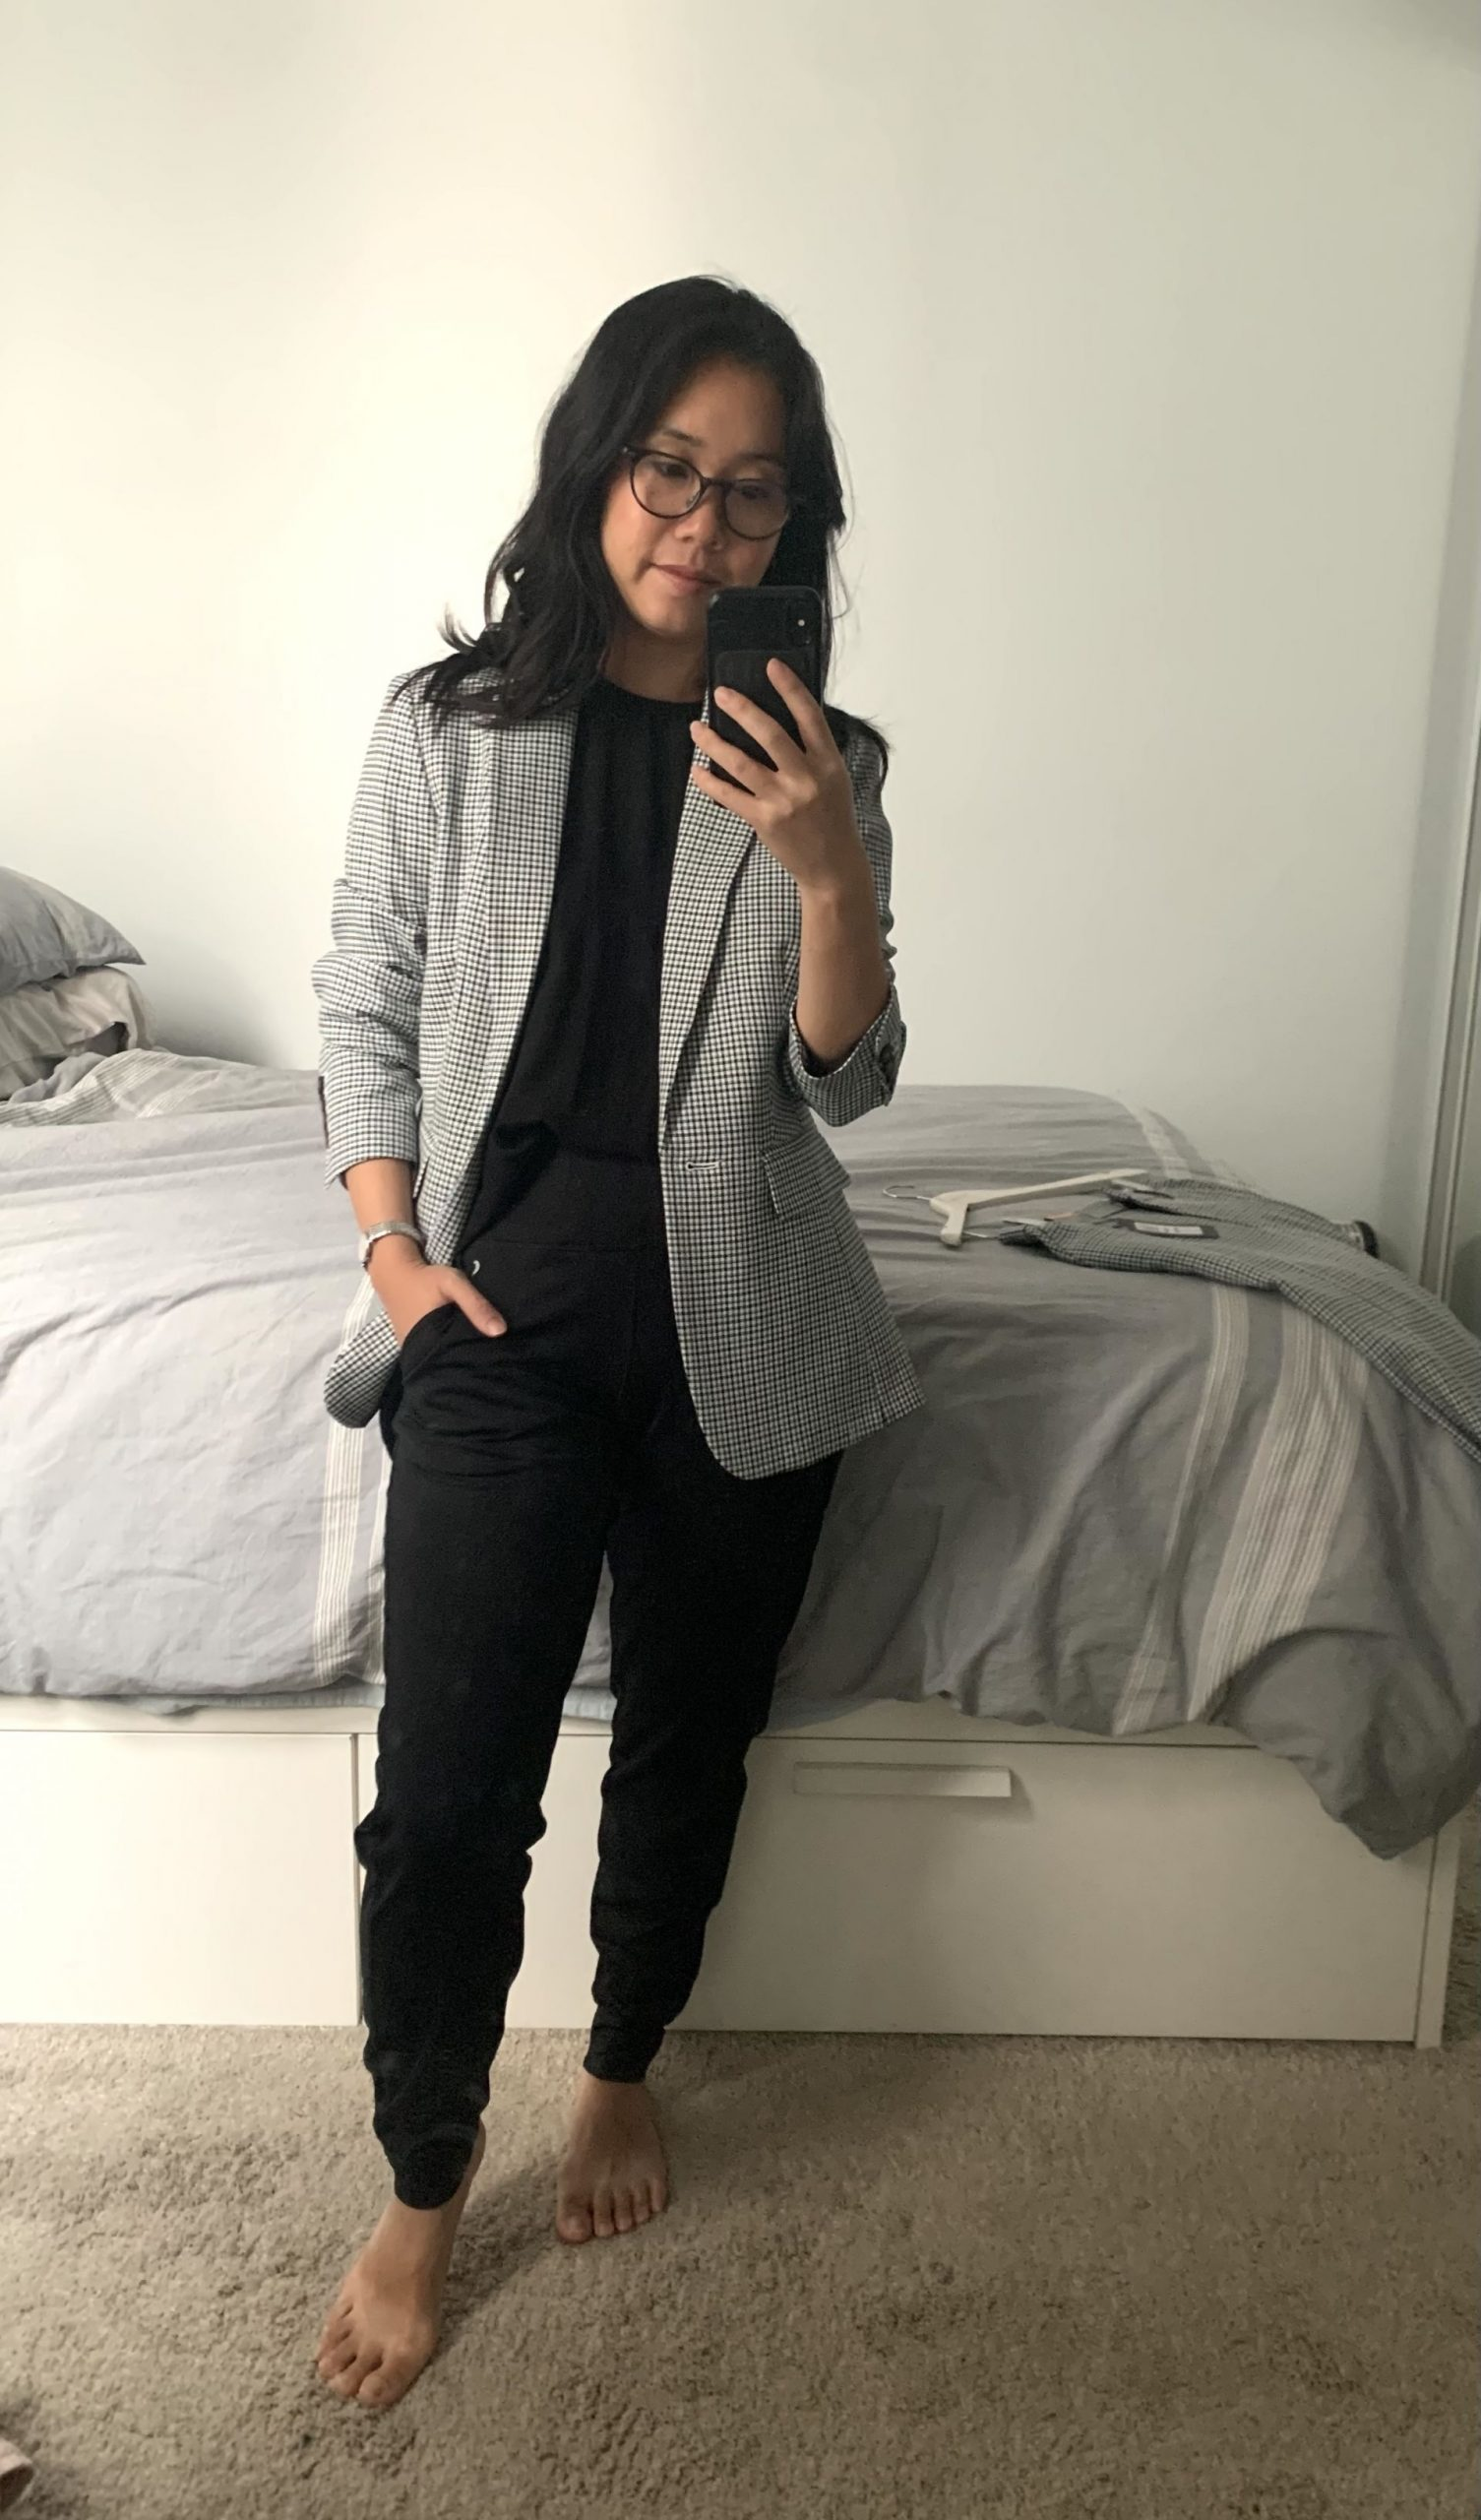 marks & spencer workwear favourites in blog post